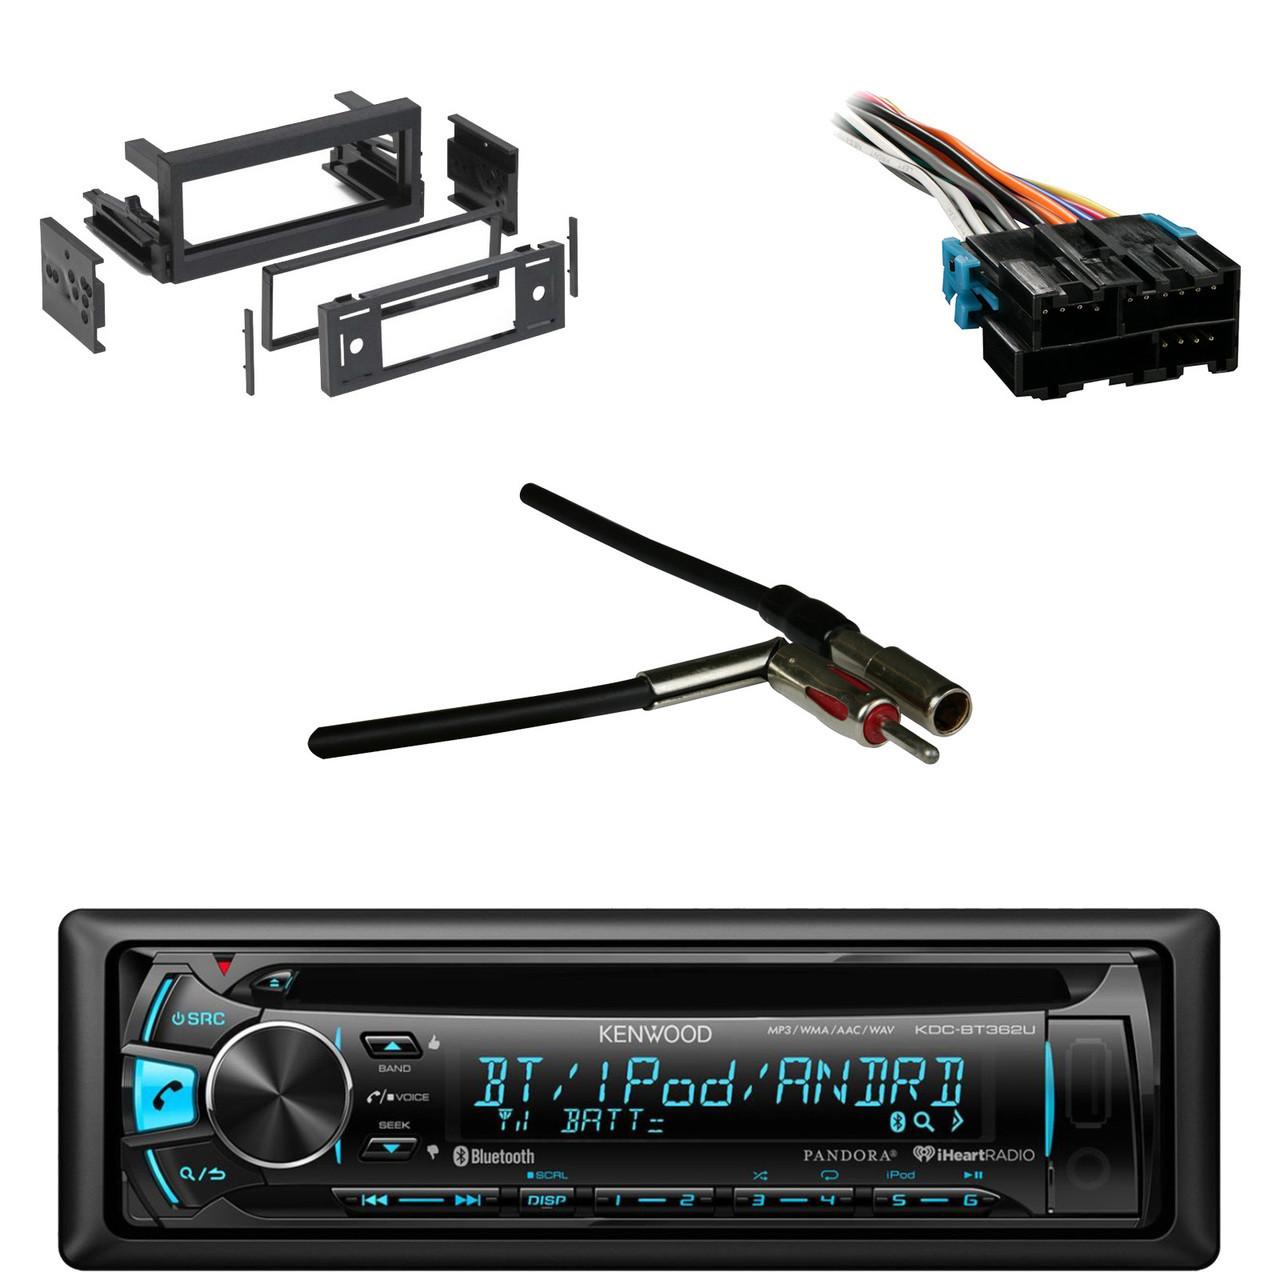 Stereo Wiring Harness Kenwood Gm. Kenwood Radio Diagram ... on